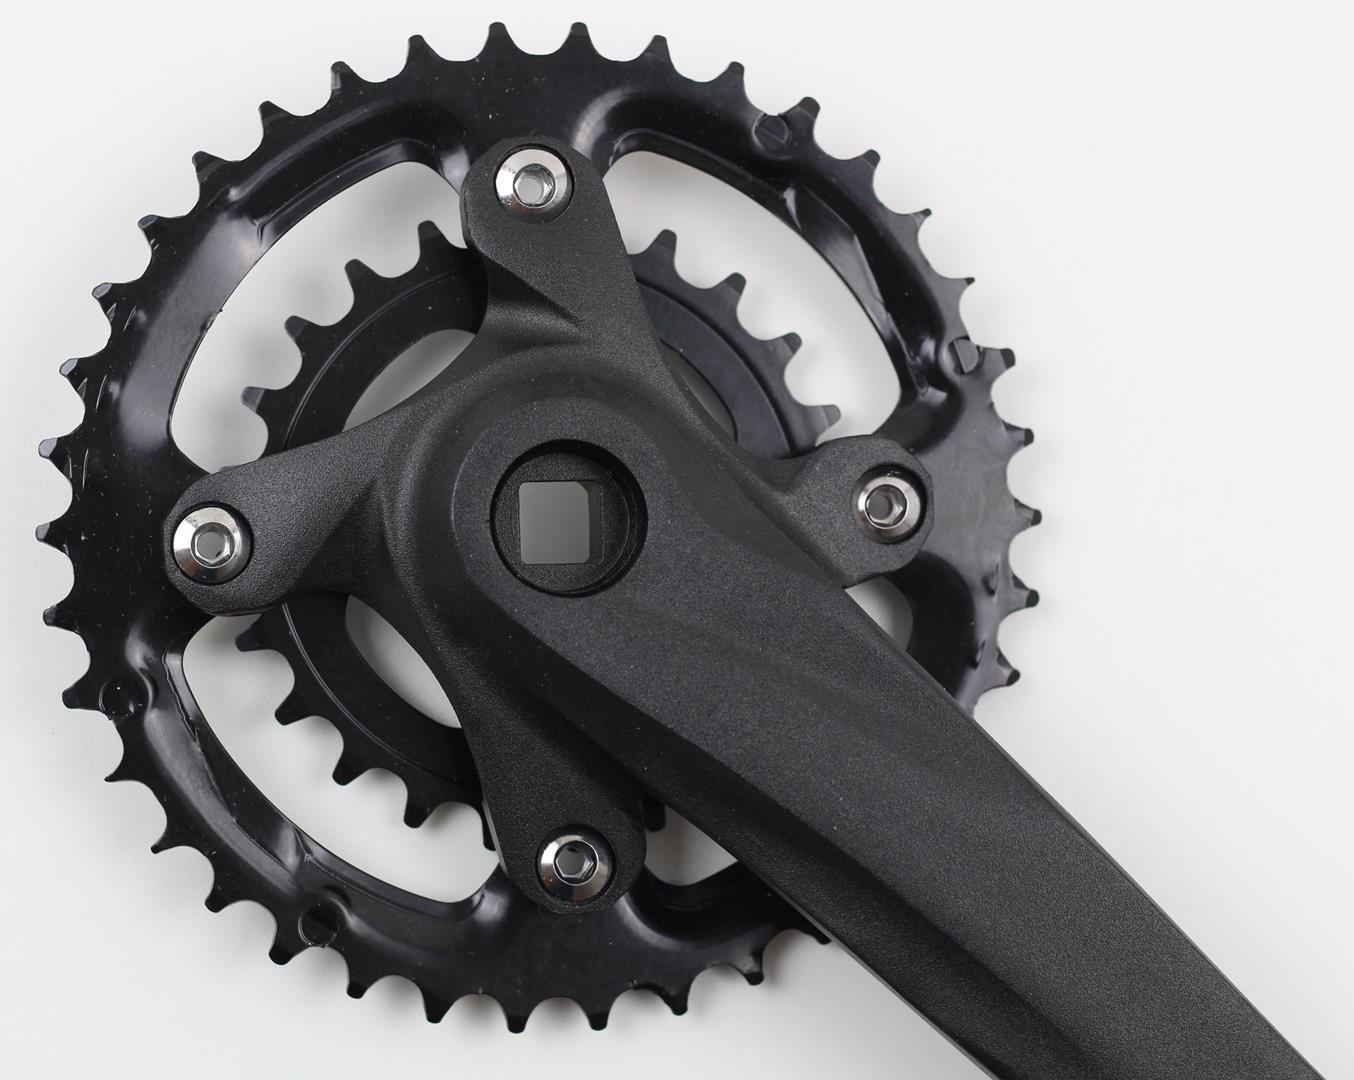 Pedivela Duplo Bicicleta Mountain-Bike Absolute 38-24 dentes 175mm para 9-10 velocidades